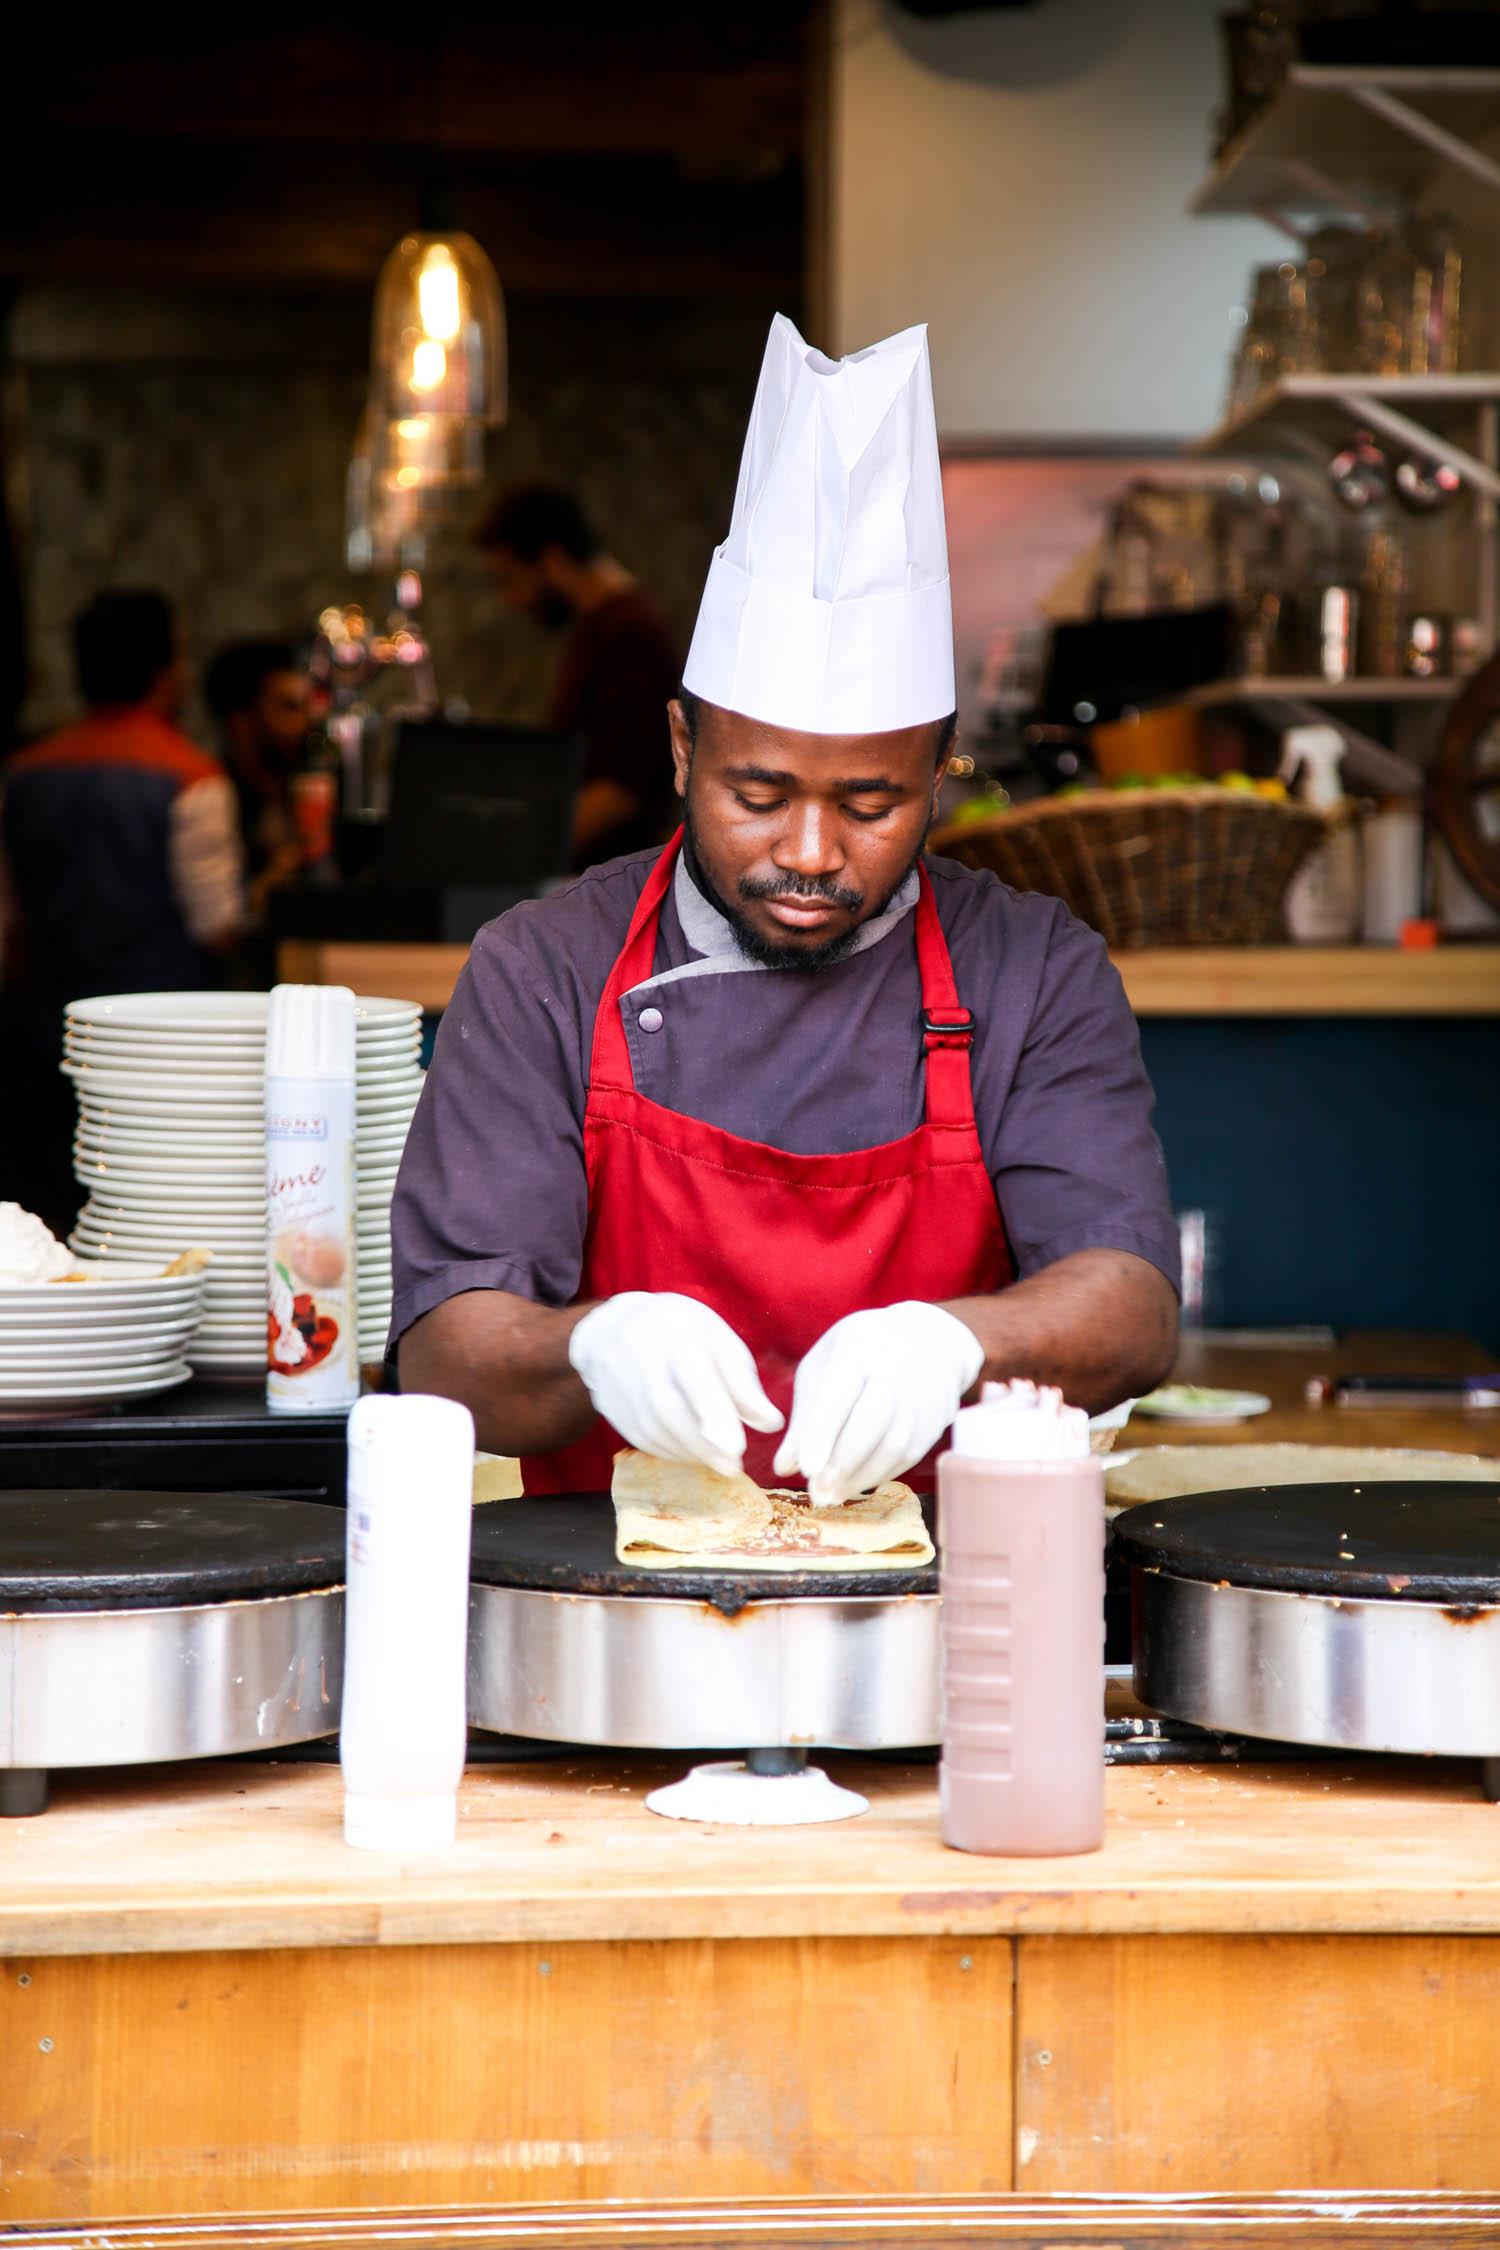 Man making crepes at a restaurant in Paris